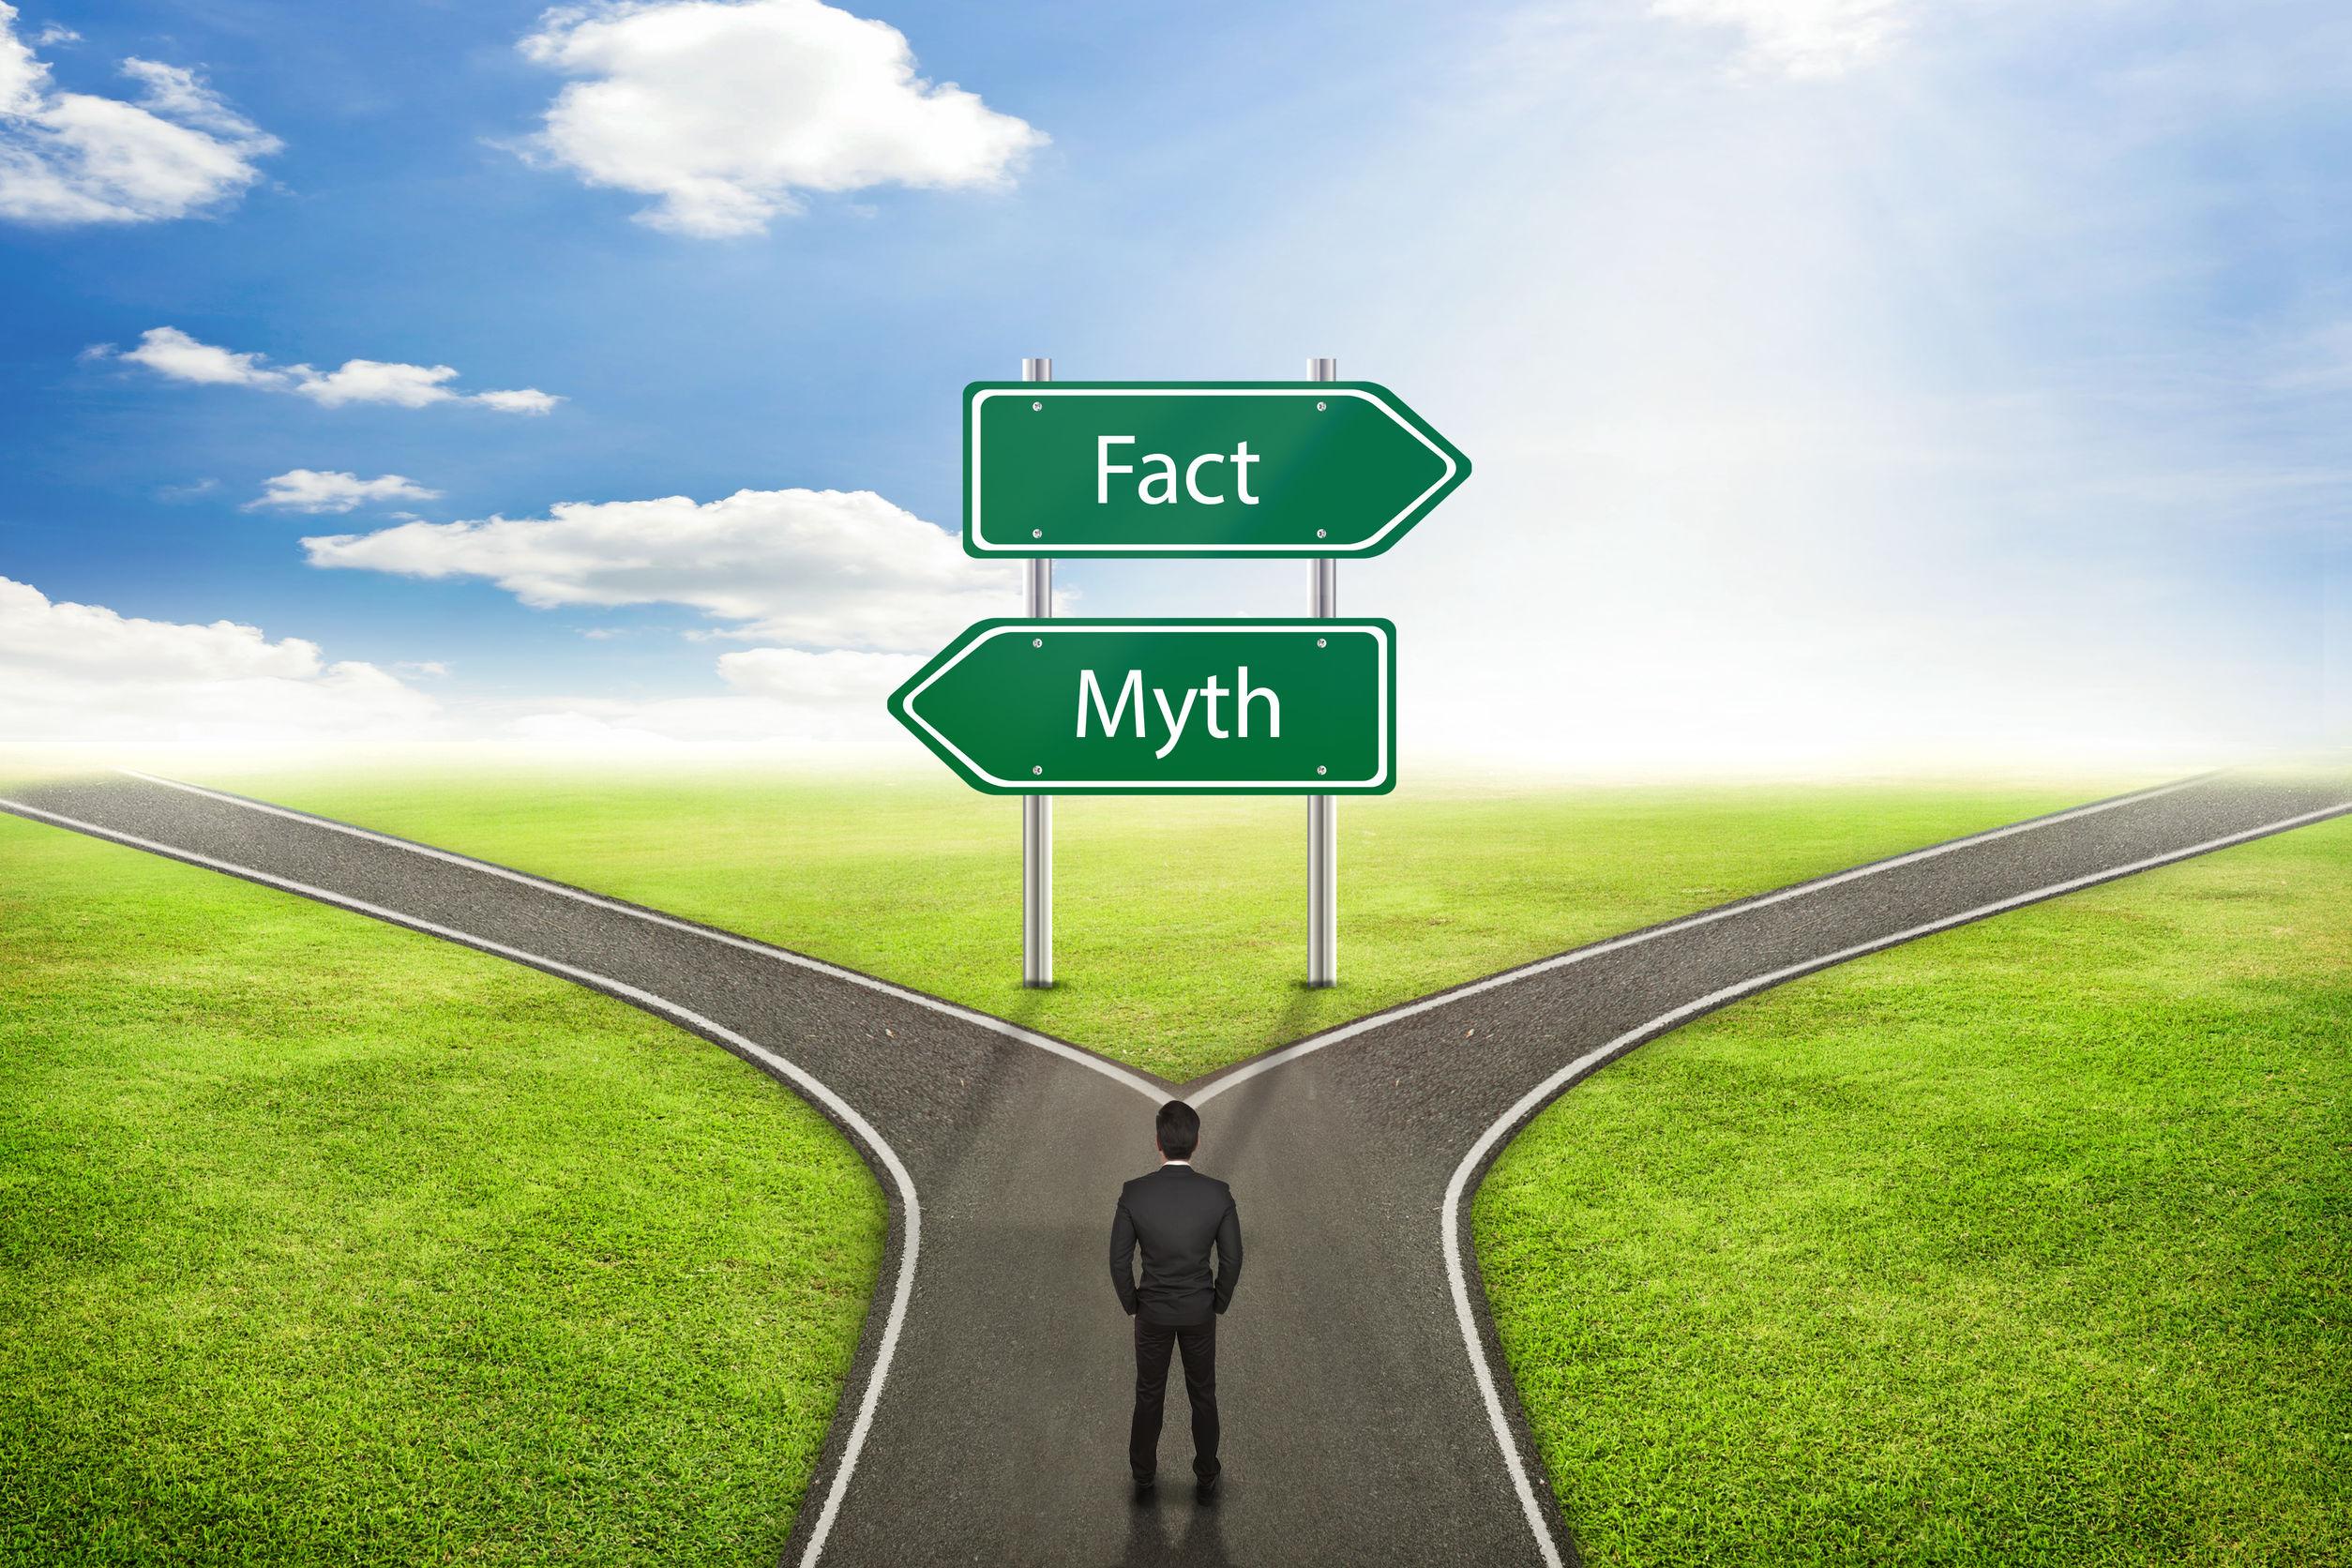 myth-fact-sign